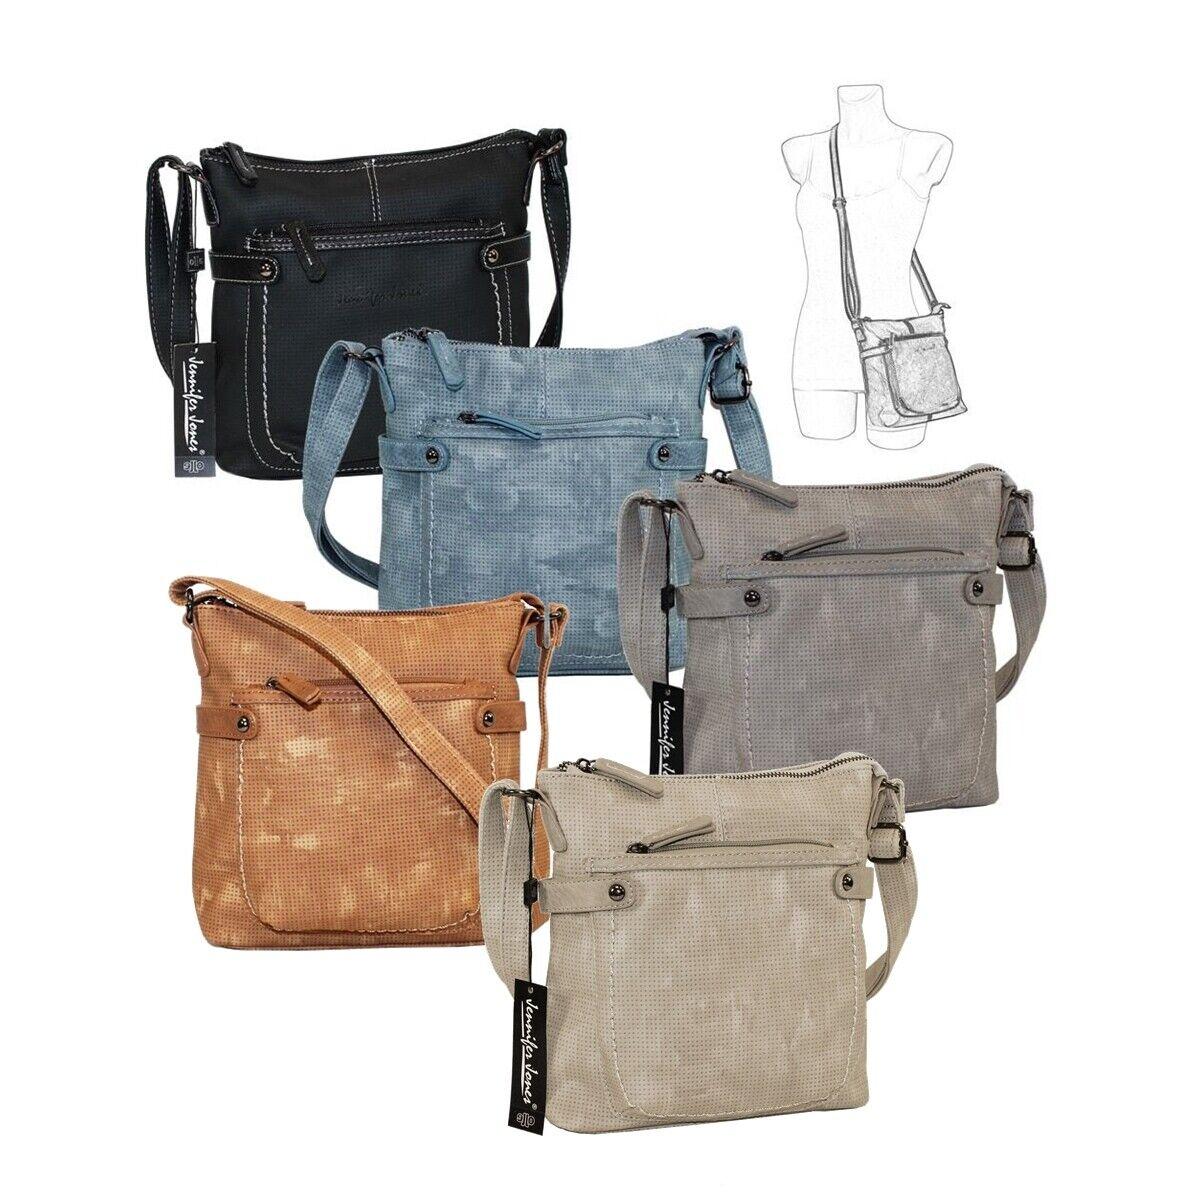 Jennifer Jones Umhängetasche Damen Handtasche Tasche Neapel unifarben Struktur